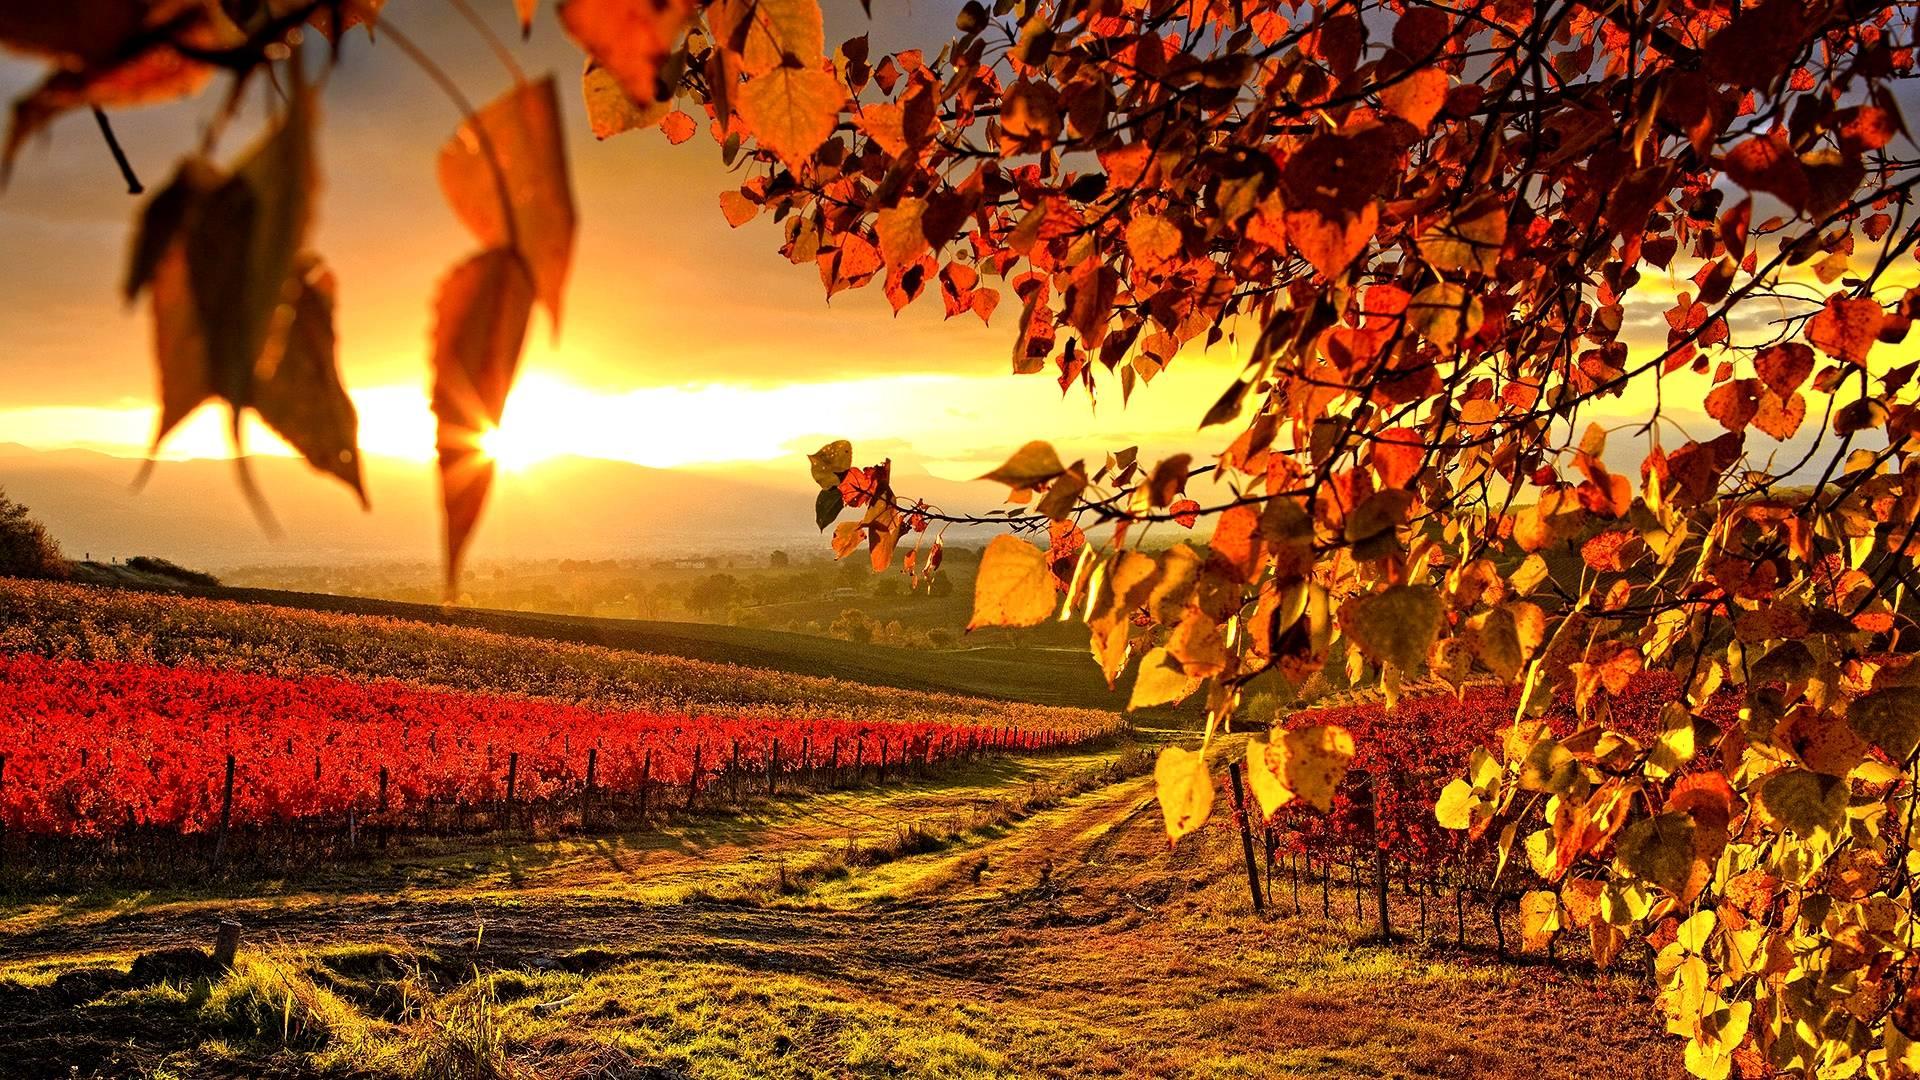 wallpapers for italian vineyard wallpaper